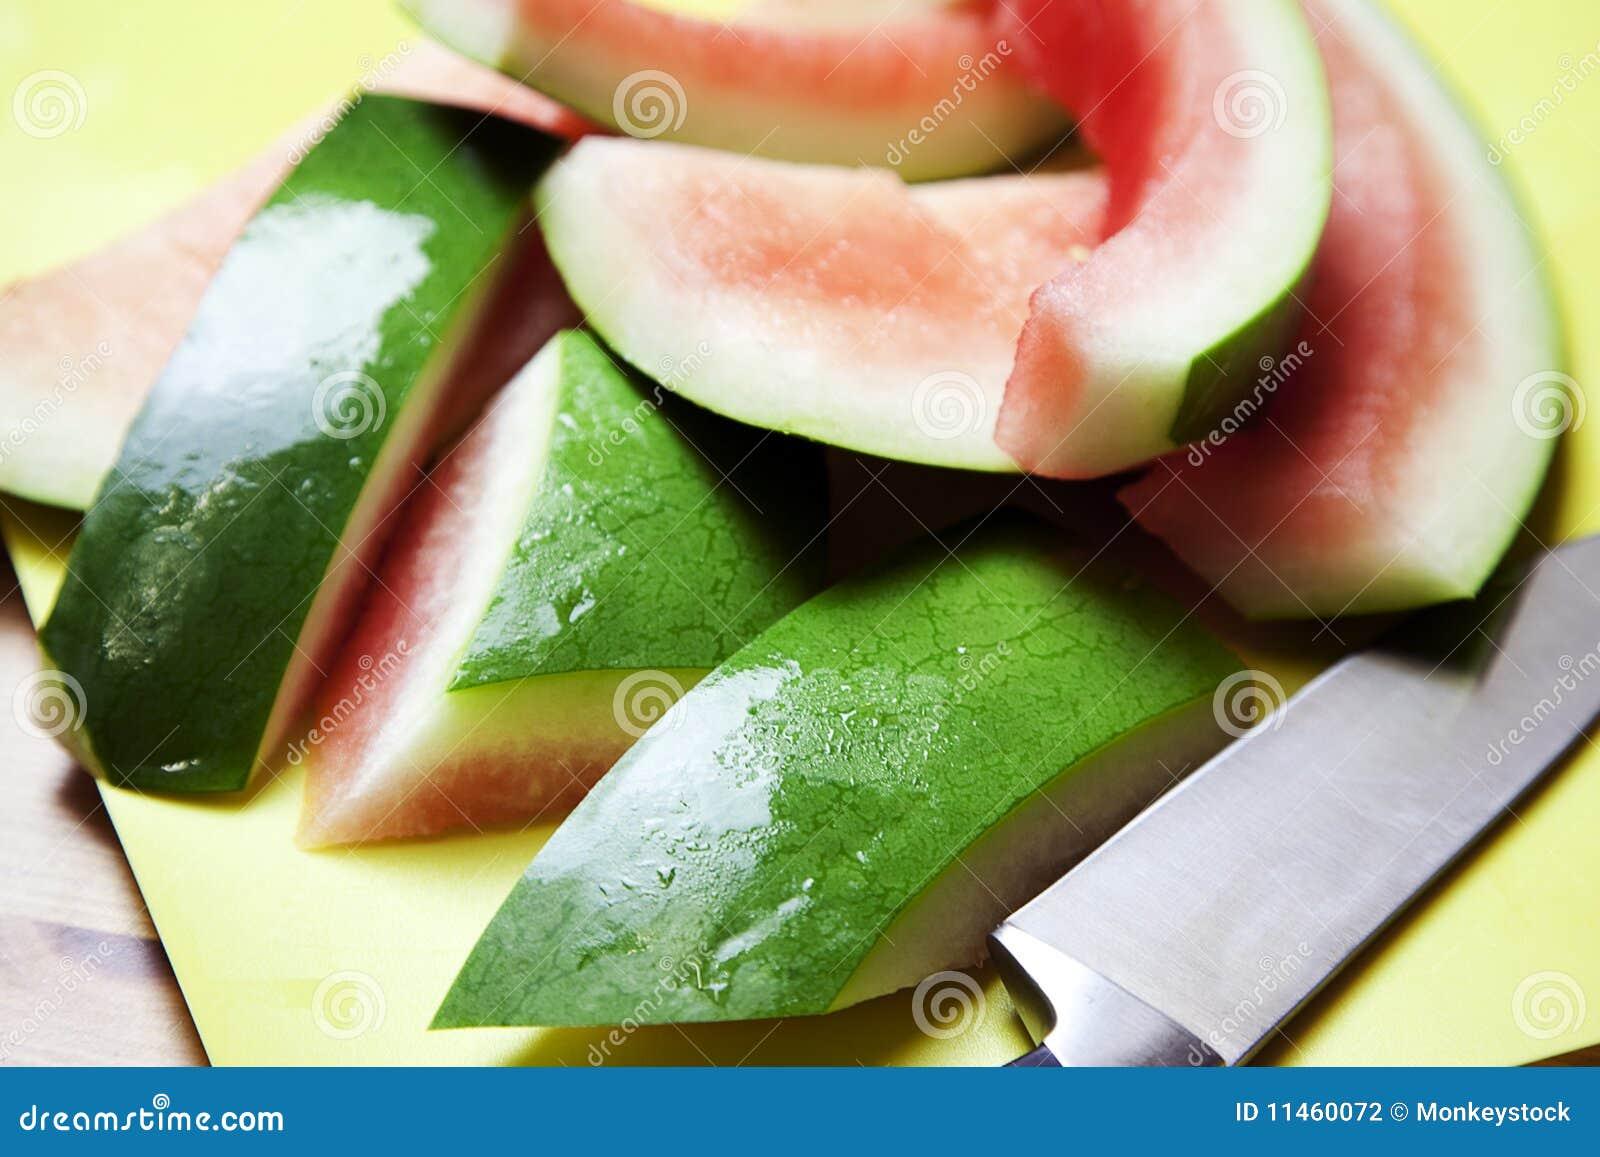 Watermelon Rind on a cutting mat